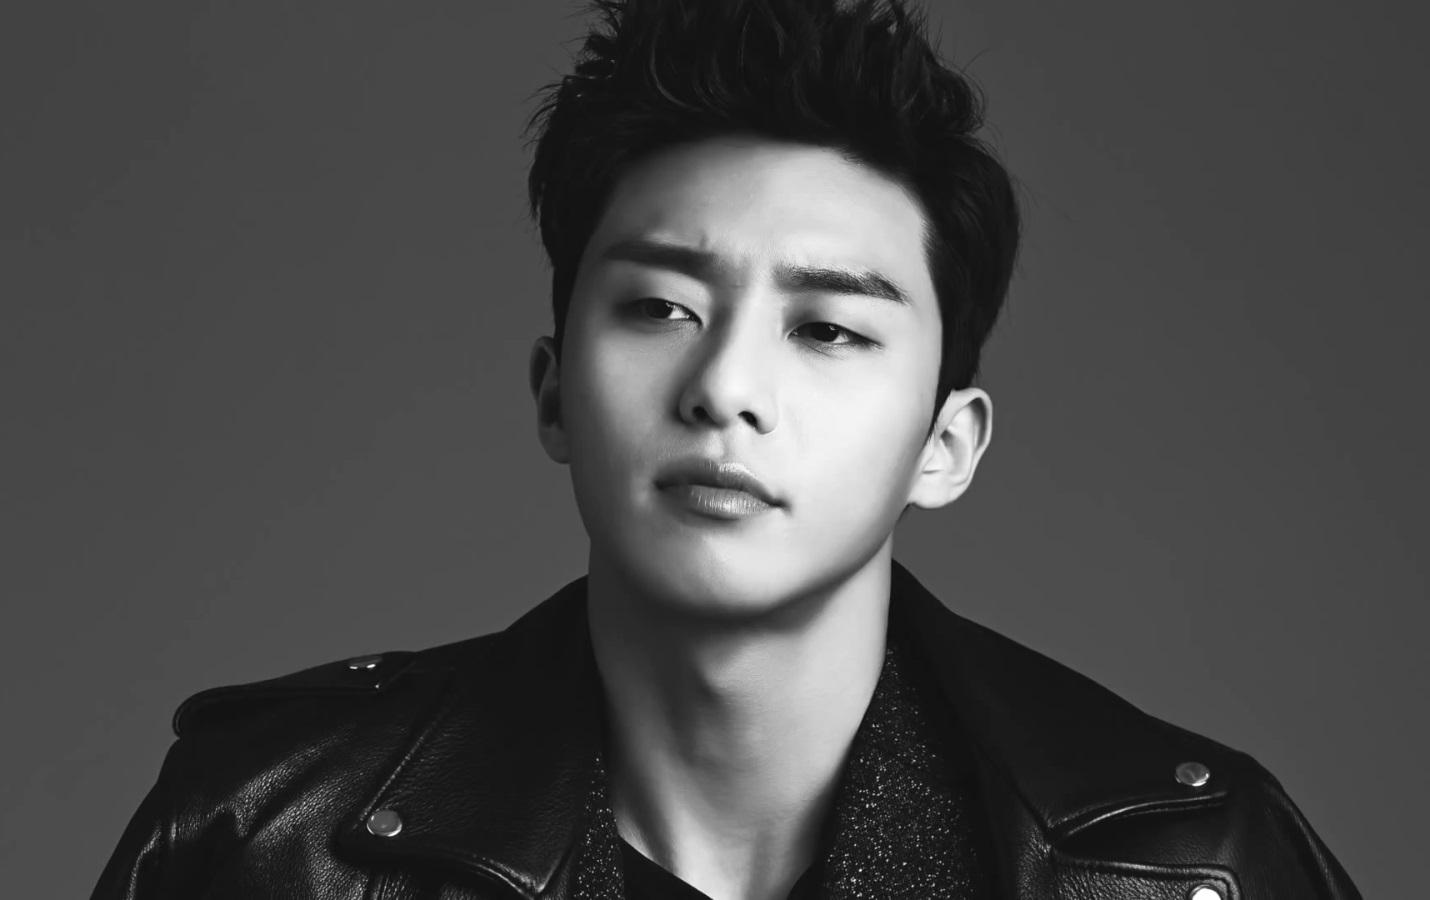 Fakta Pemain Kdrama Hwarang Park Seo Joon 1